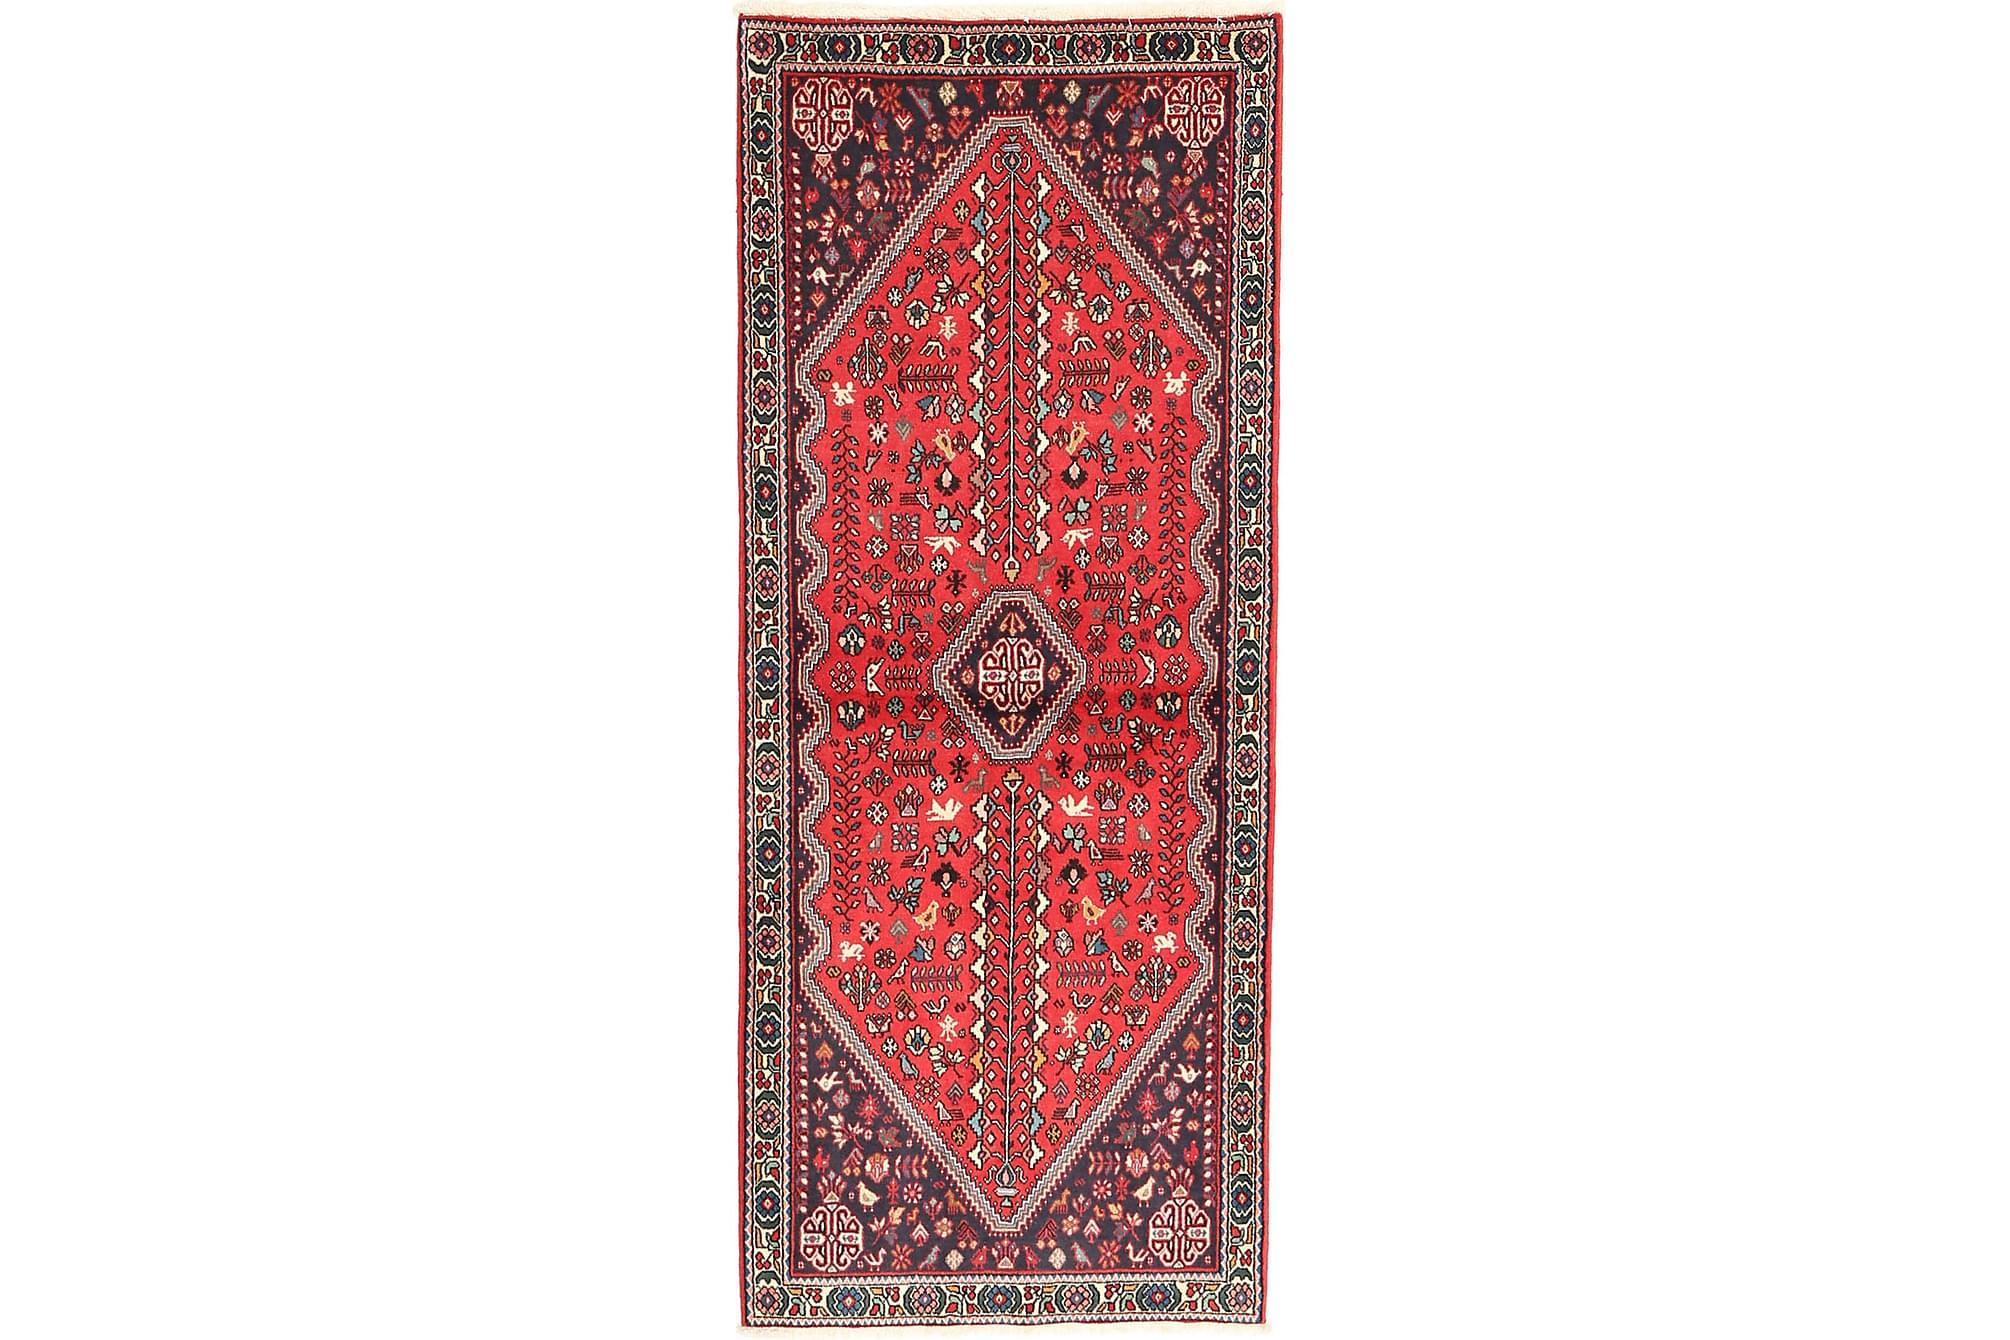 ABADEH Matta 87x204 Stor Röd, Orientaliska mattor